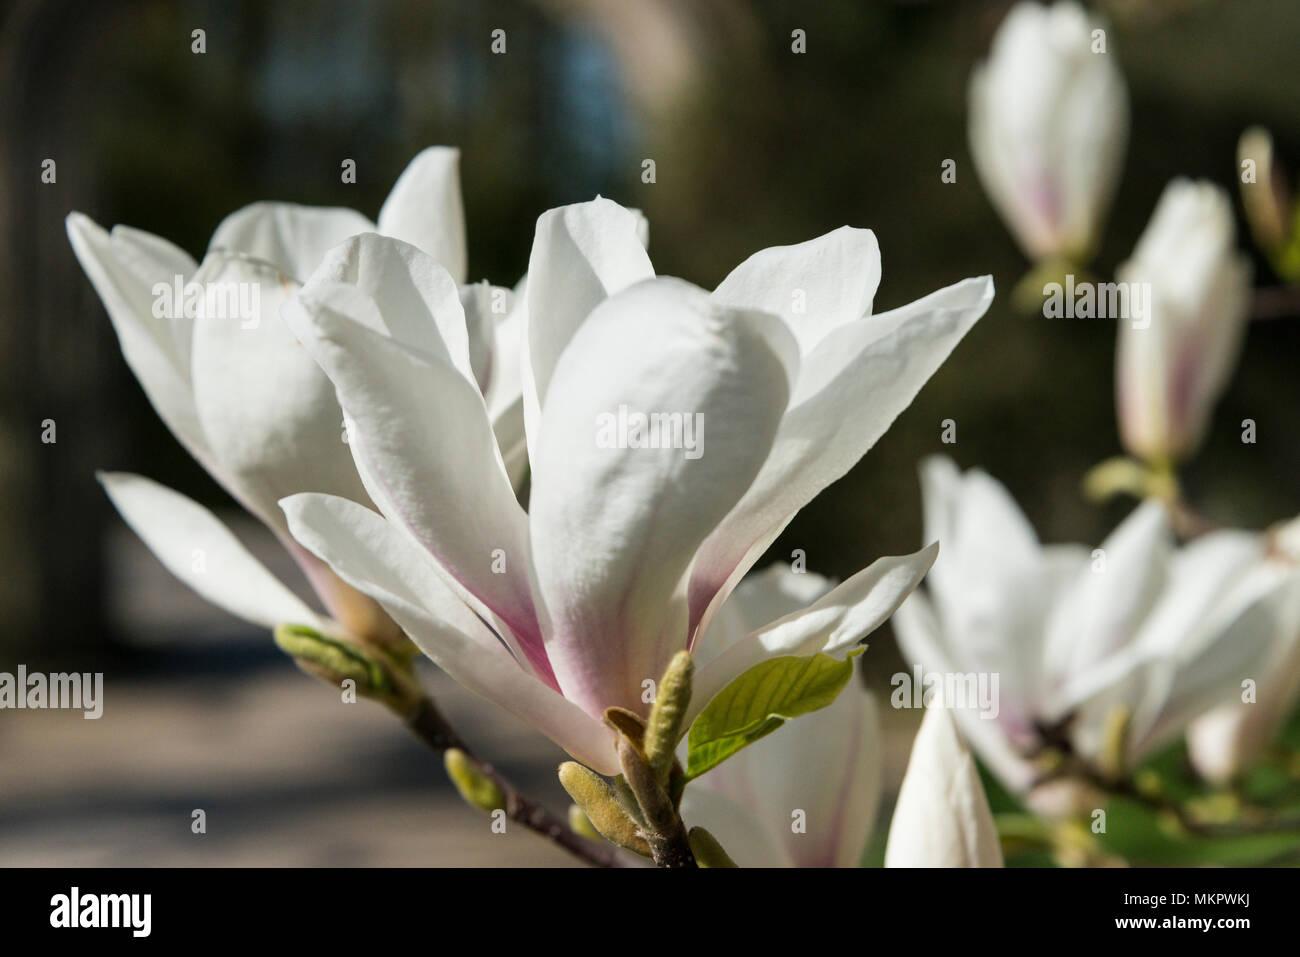 A White Flower Of A Saucer Magnolia Tree Magnolia Soulangeana